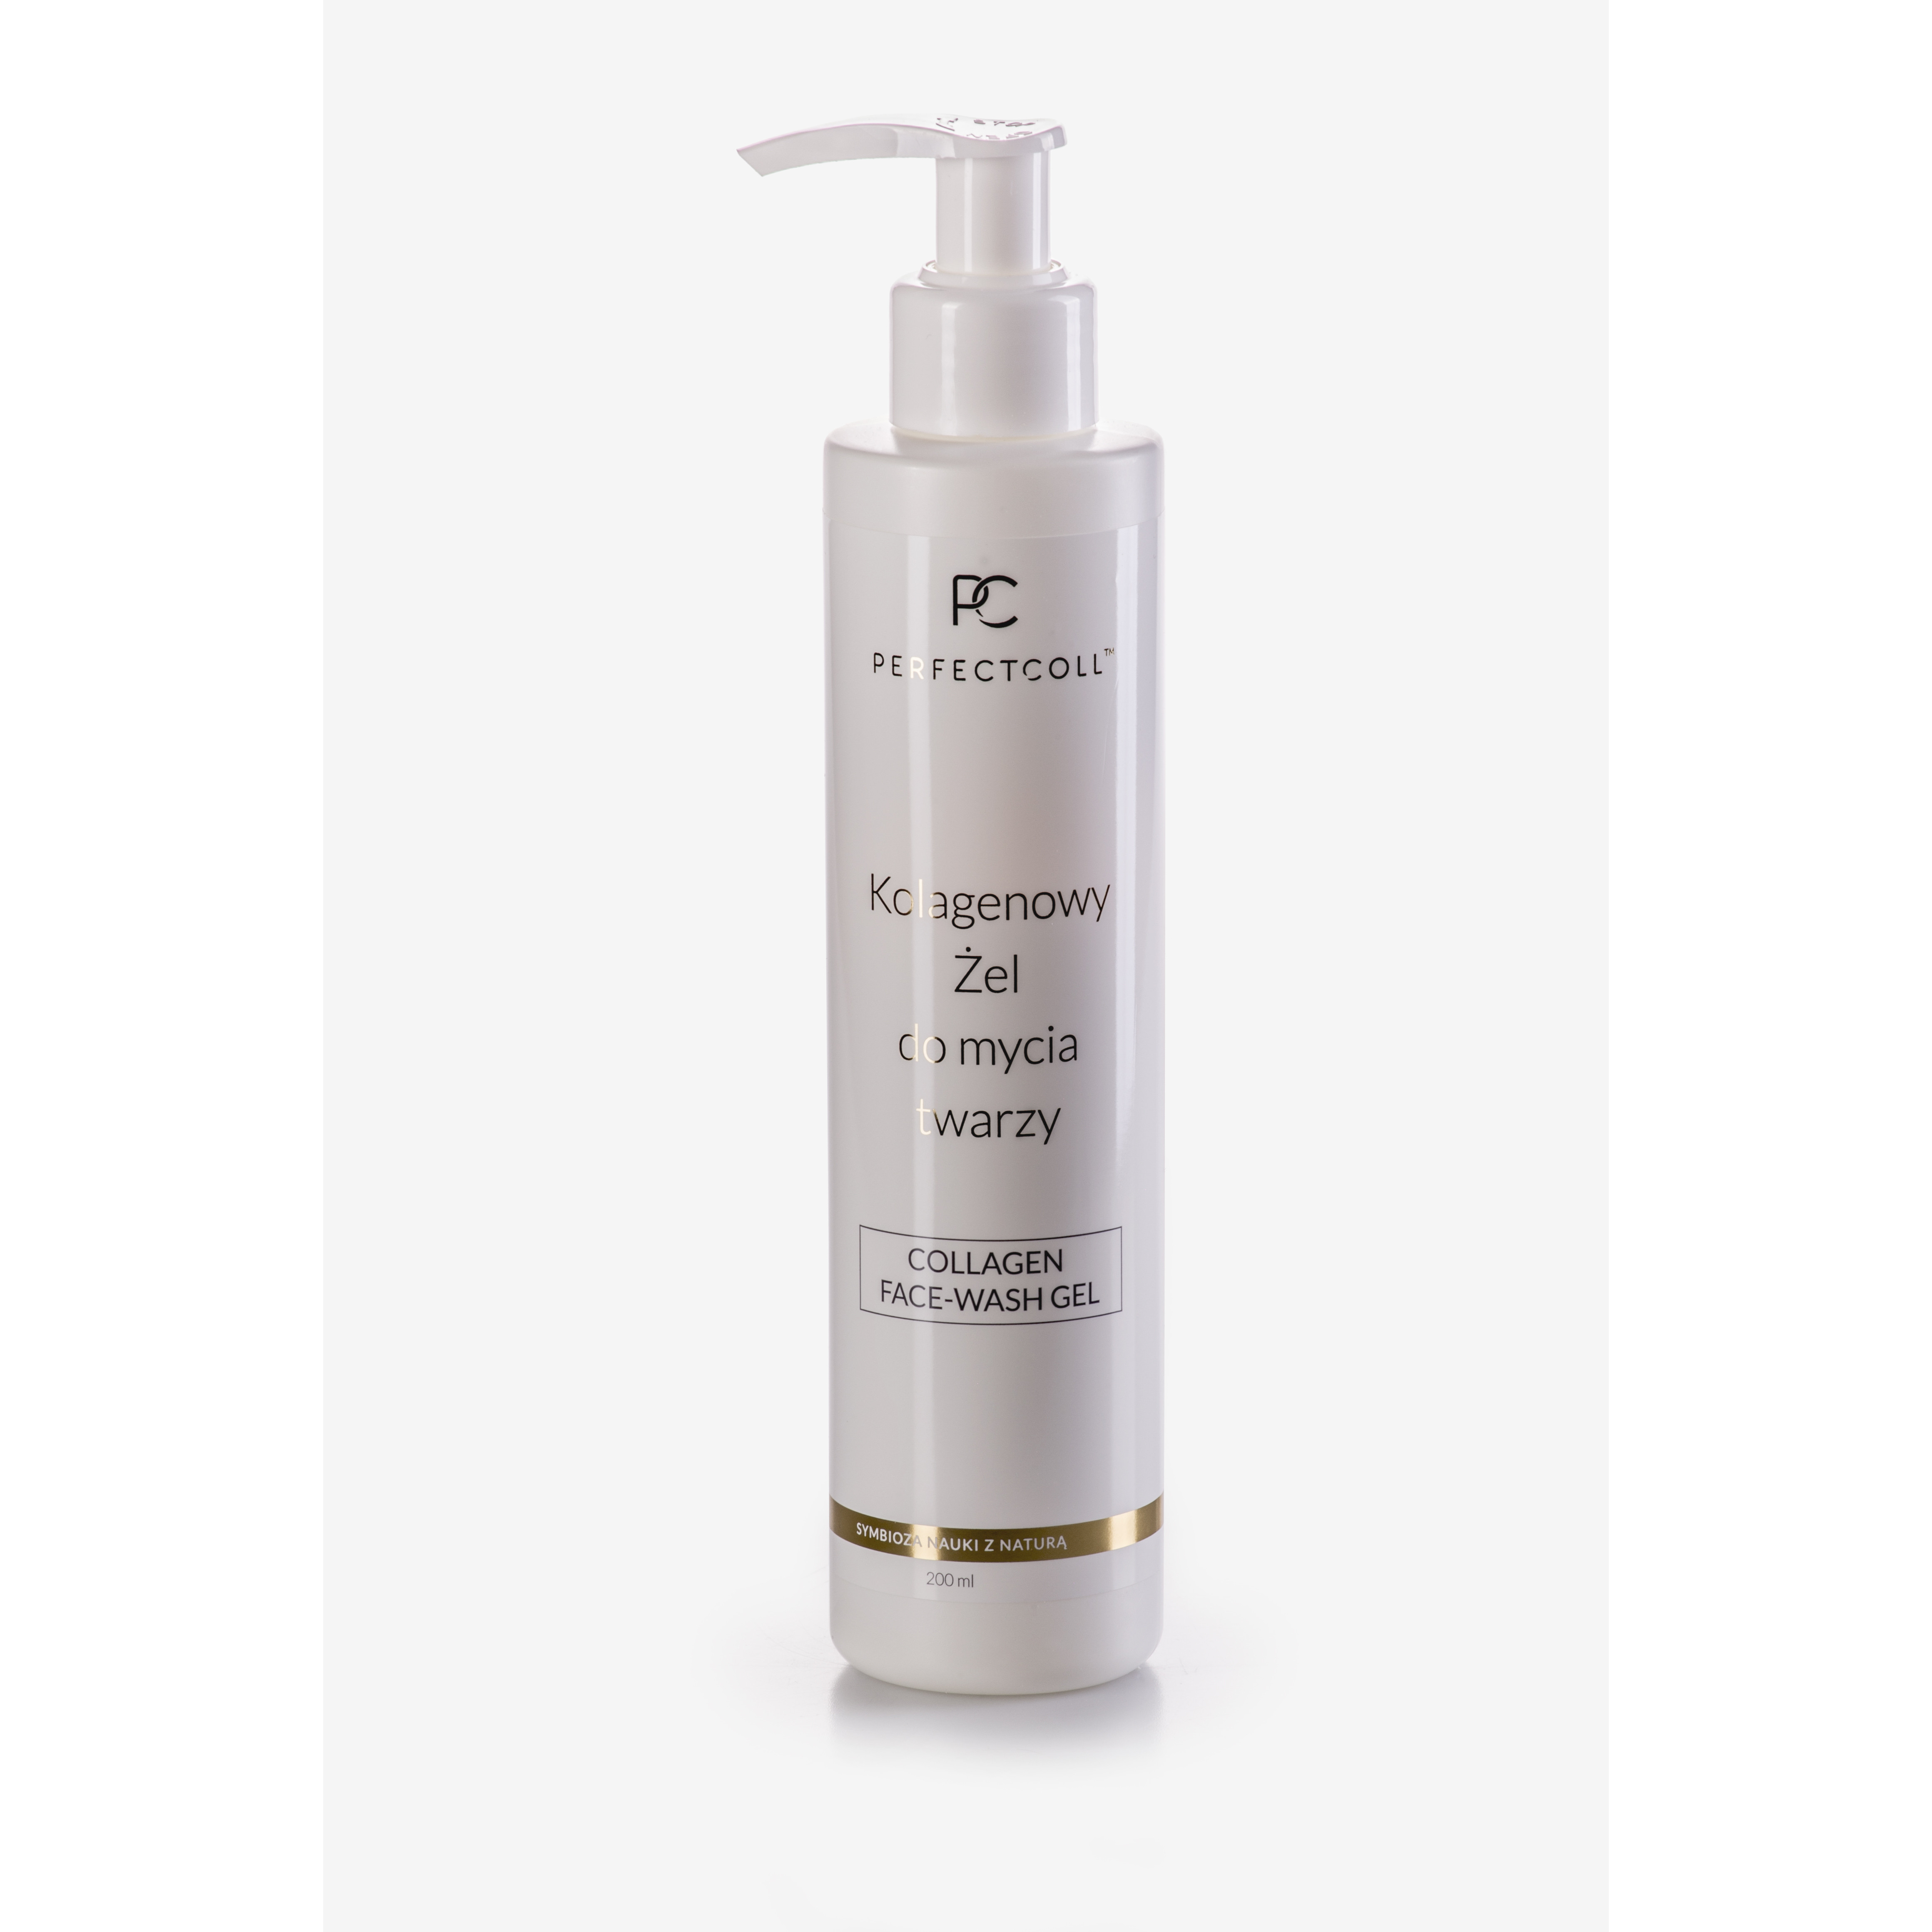 Sữa rửa mặt dưỡng ẩm - PC Collagen Face Wash Gel